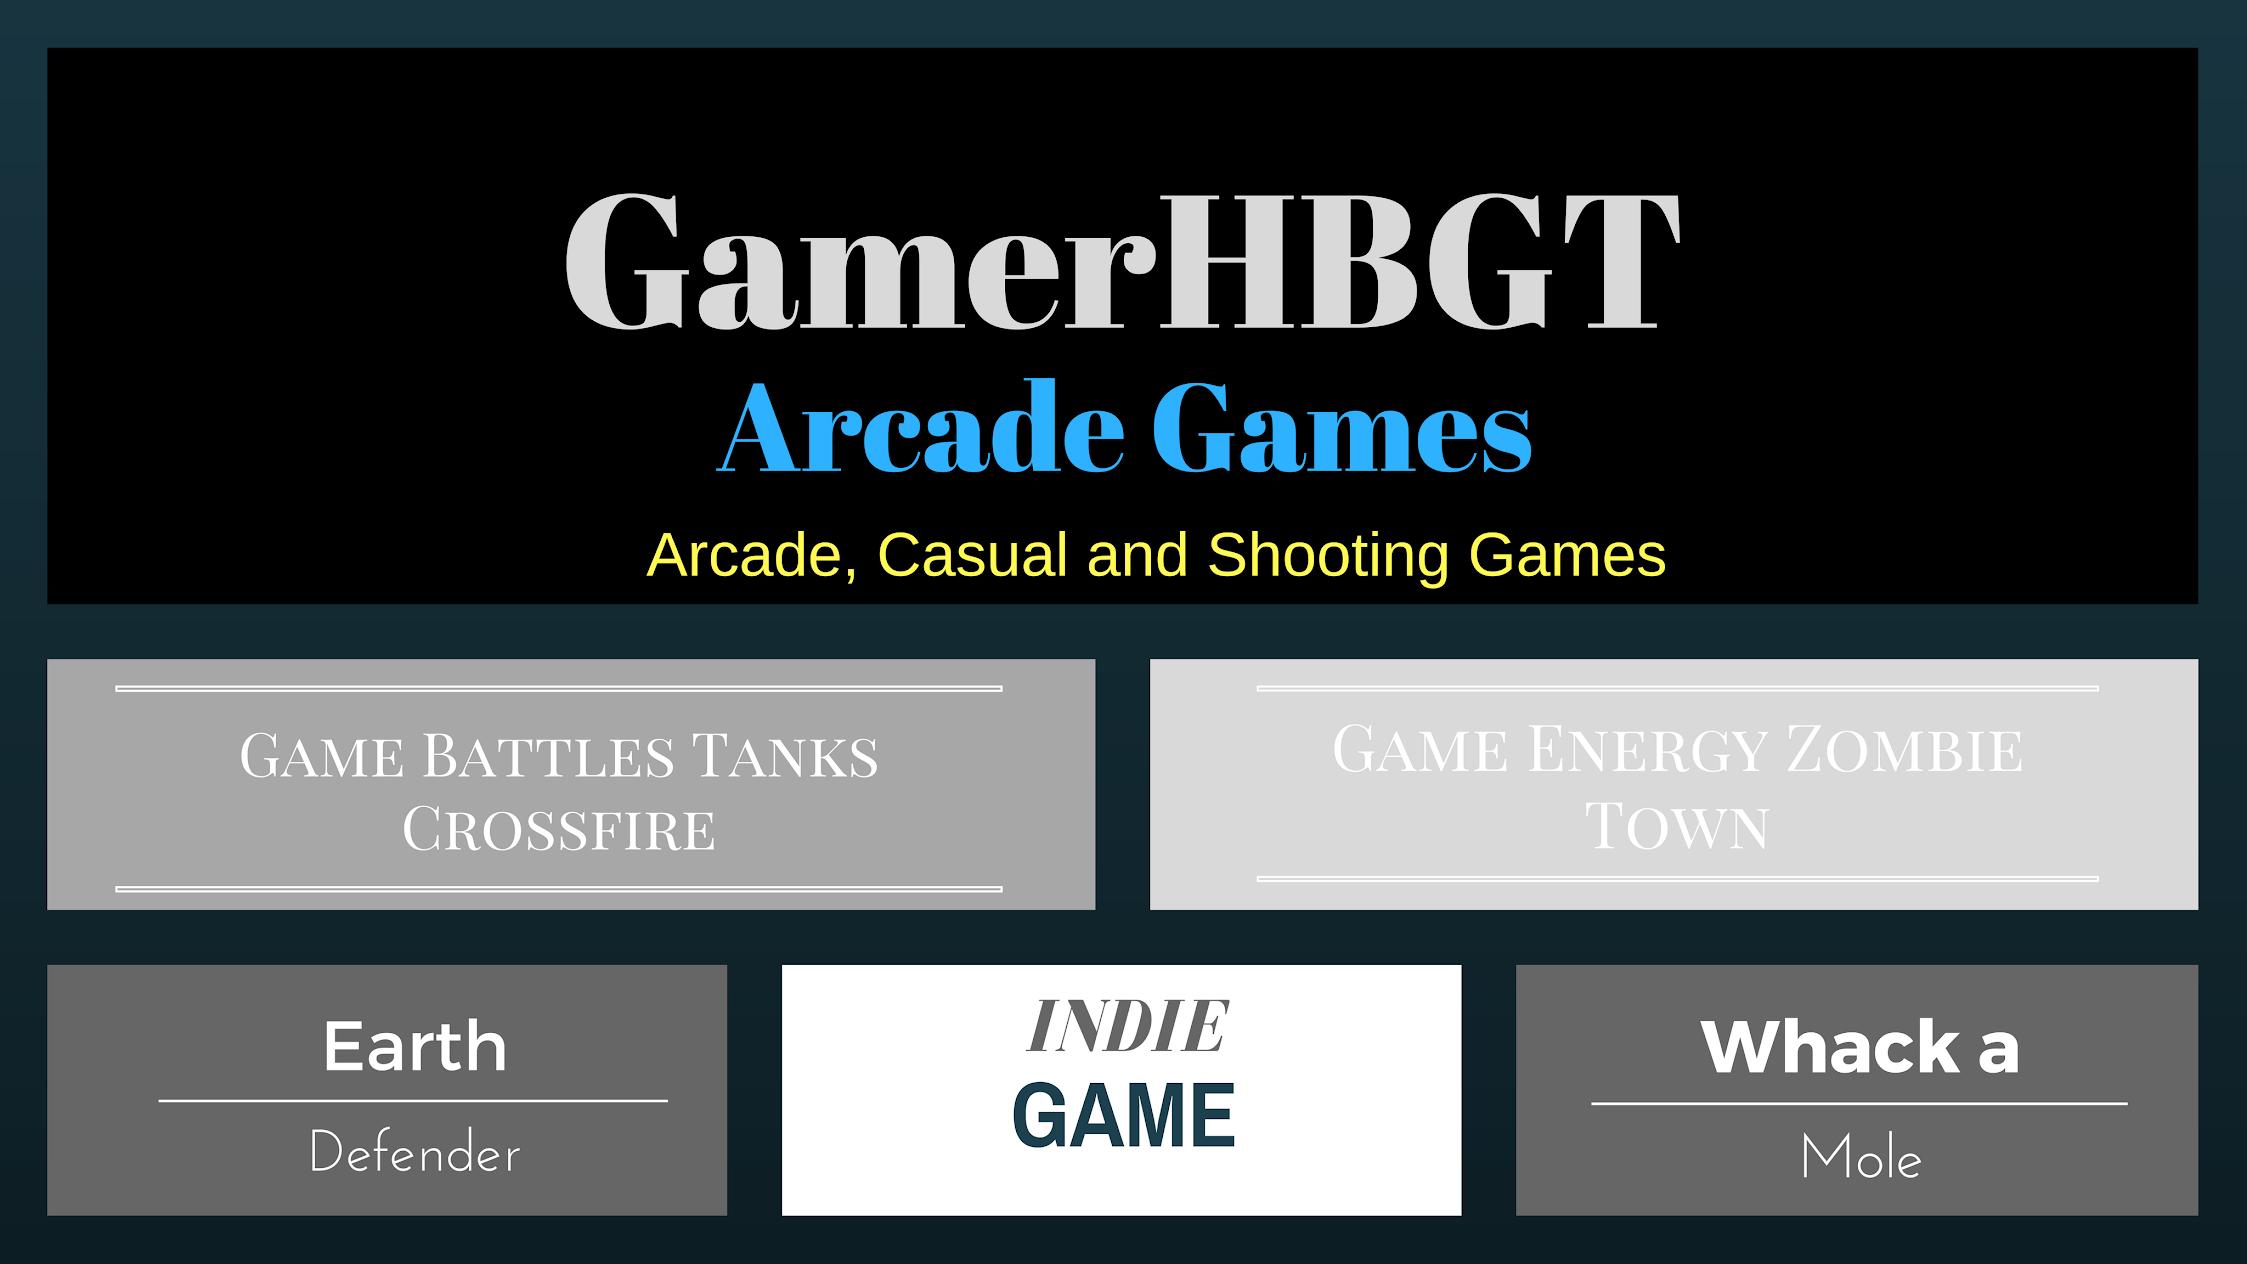 GamerHBGT